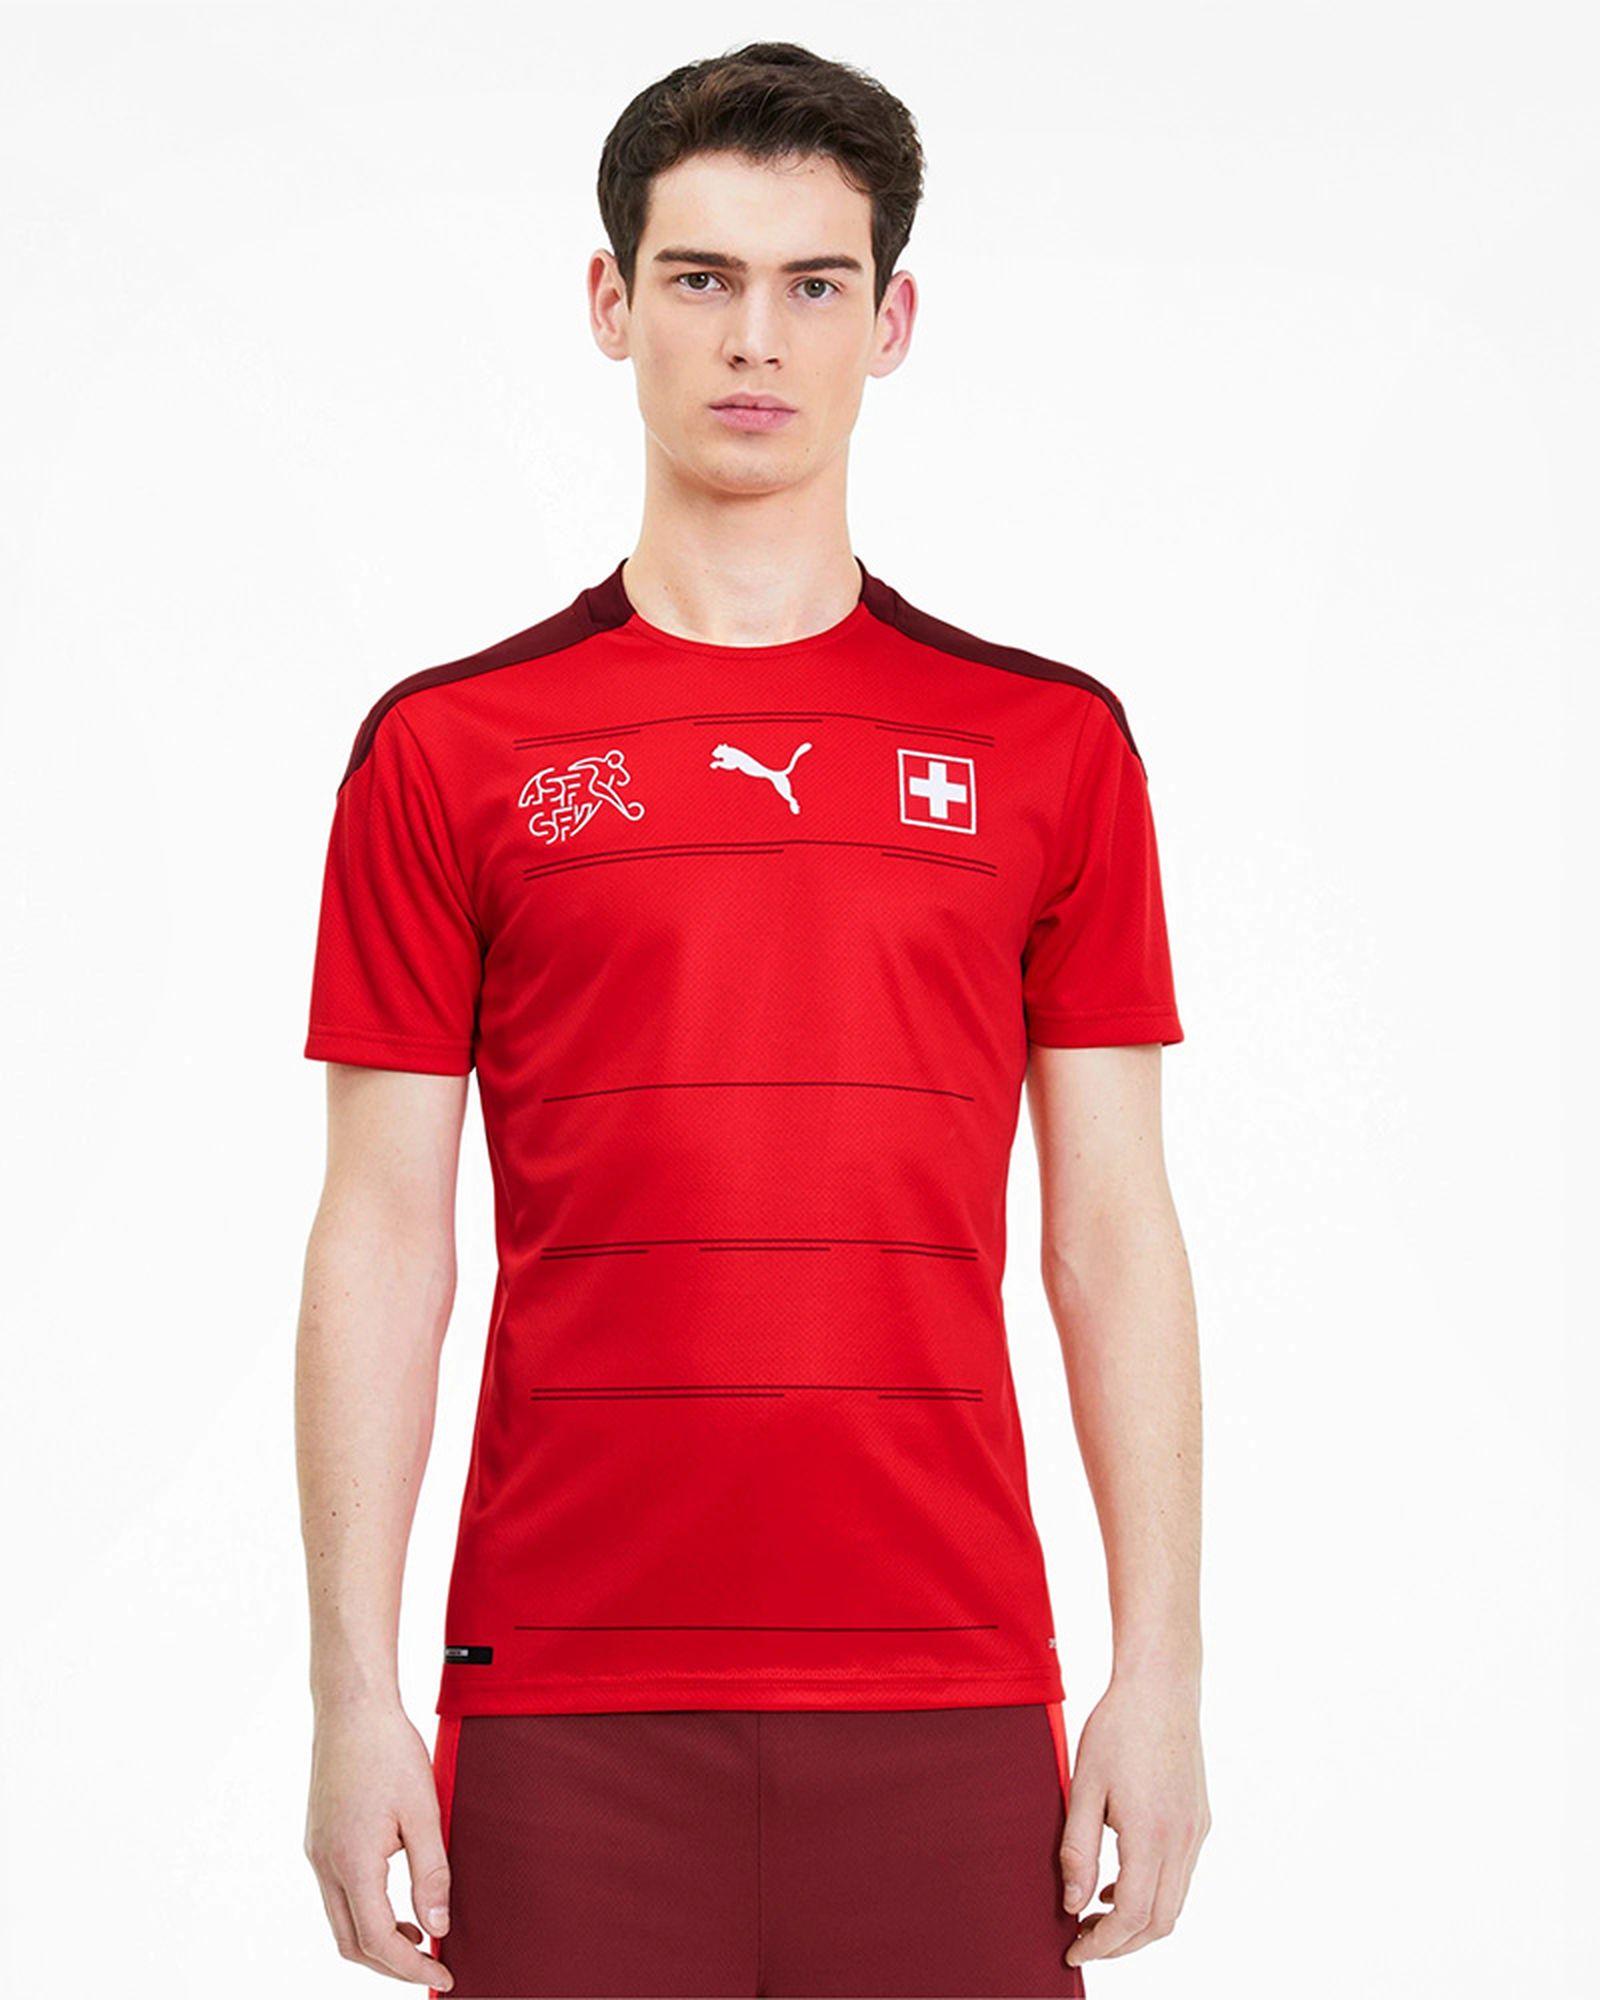 euro-2020-jersey-roundtable-ranking-switzerland-01